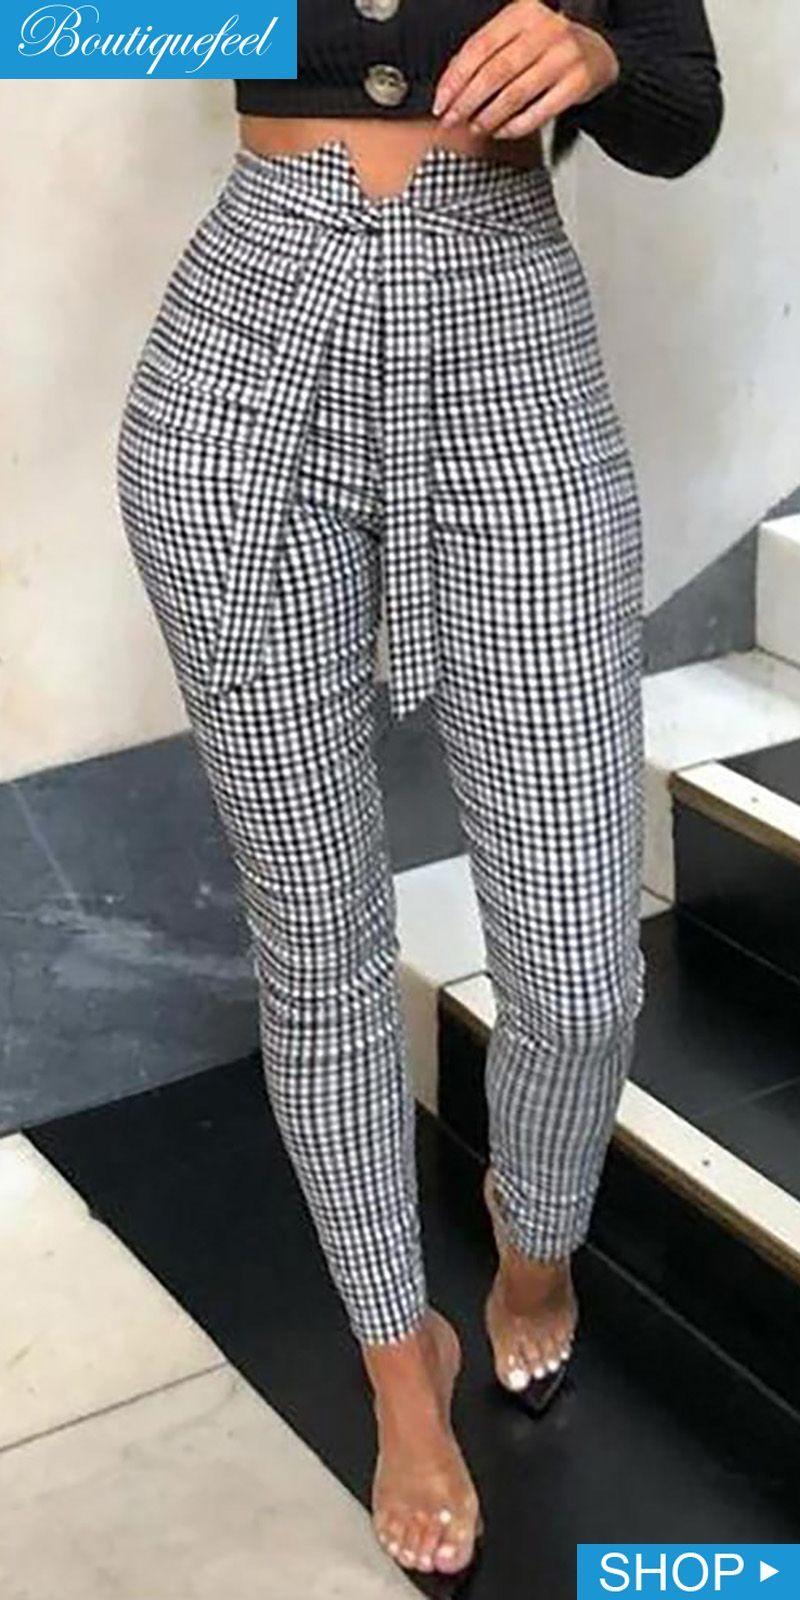 Colorblock Striped Cami Top Short Set Pantalones De Vestir Mujer Pantalones De Moda Pantalones De Moda Mujer